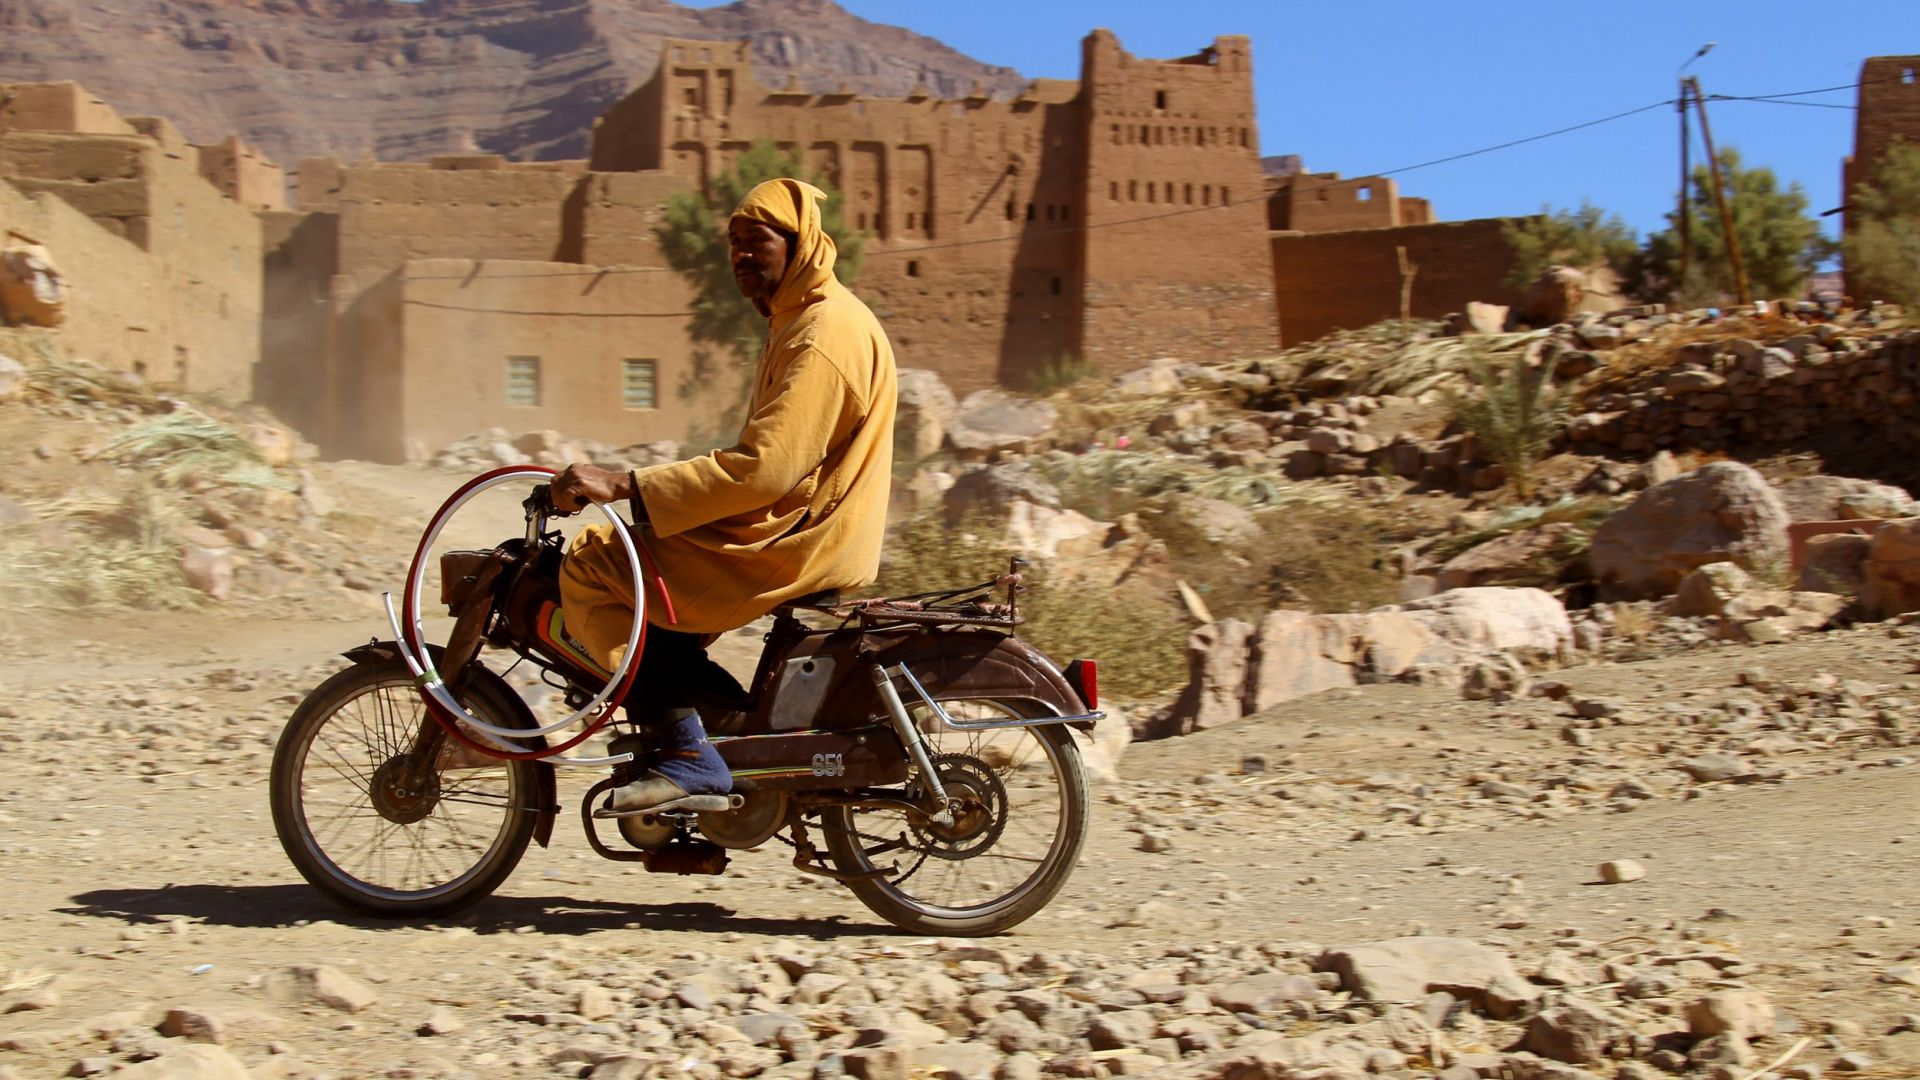 Immagine 22: In Marocco con la Yamaha Super Ténéré